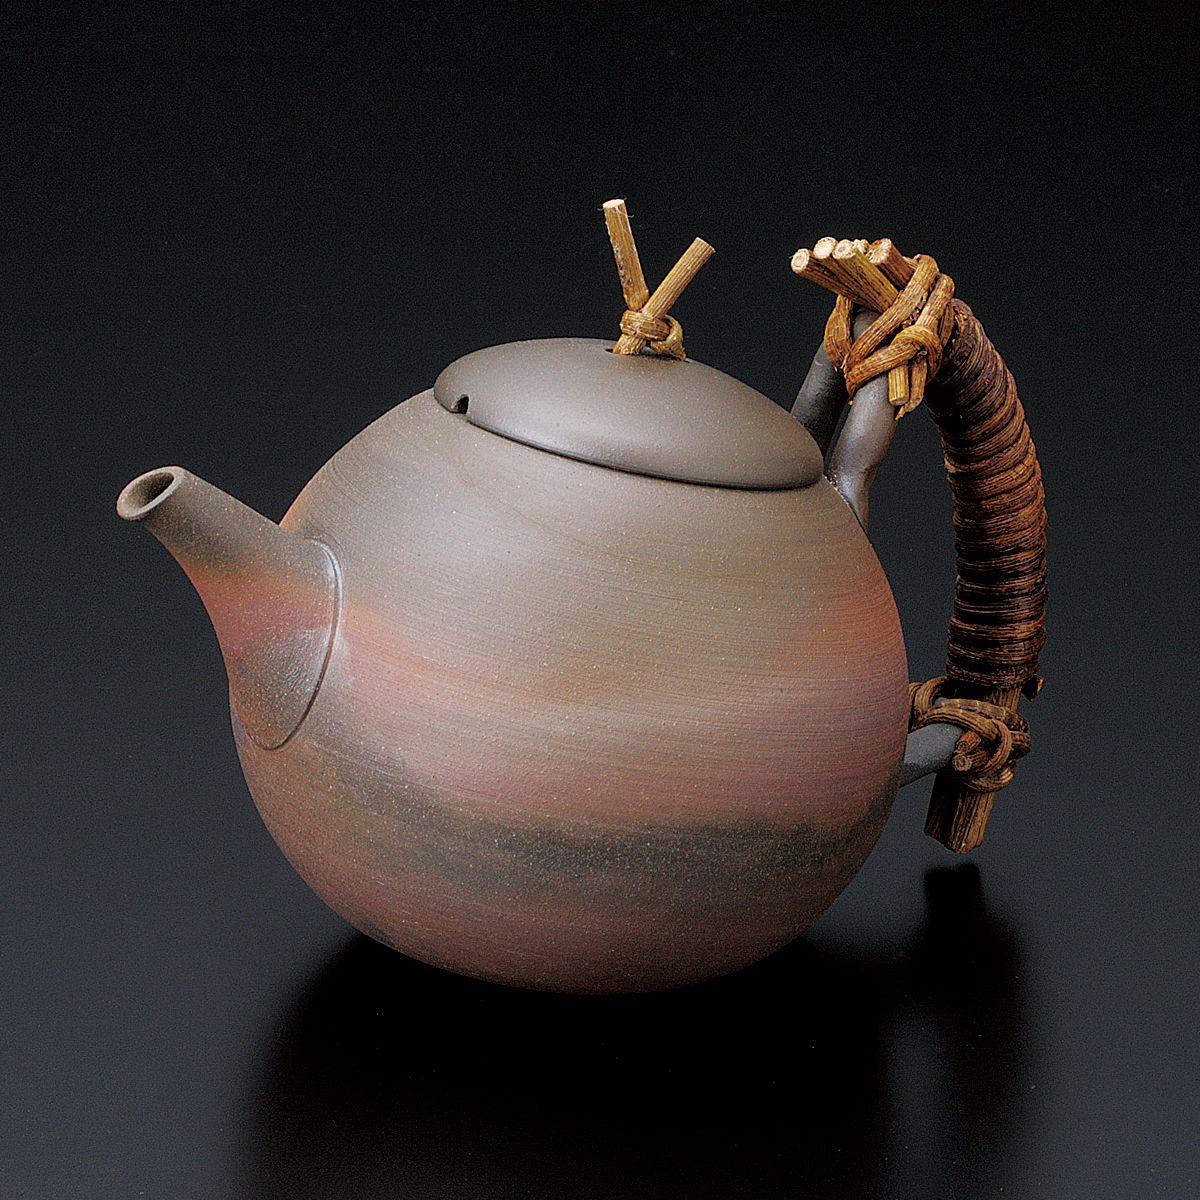 [Premium] Tokoname Pottery : SEIJI ITO - Japanese Kyusu tea pot 450cc Ceramic fine mesh net #teapots